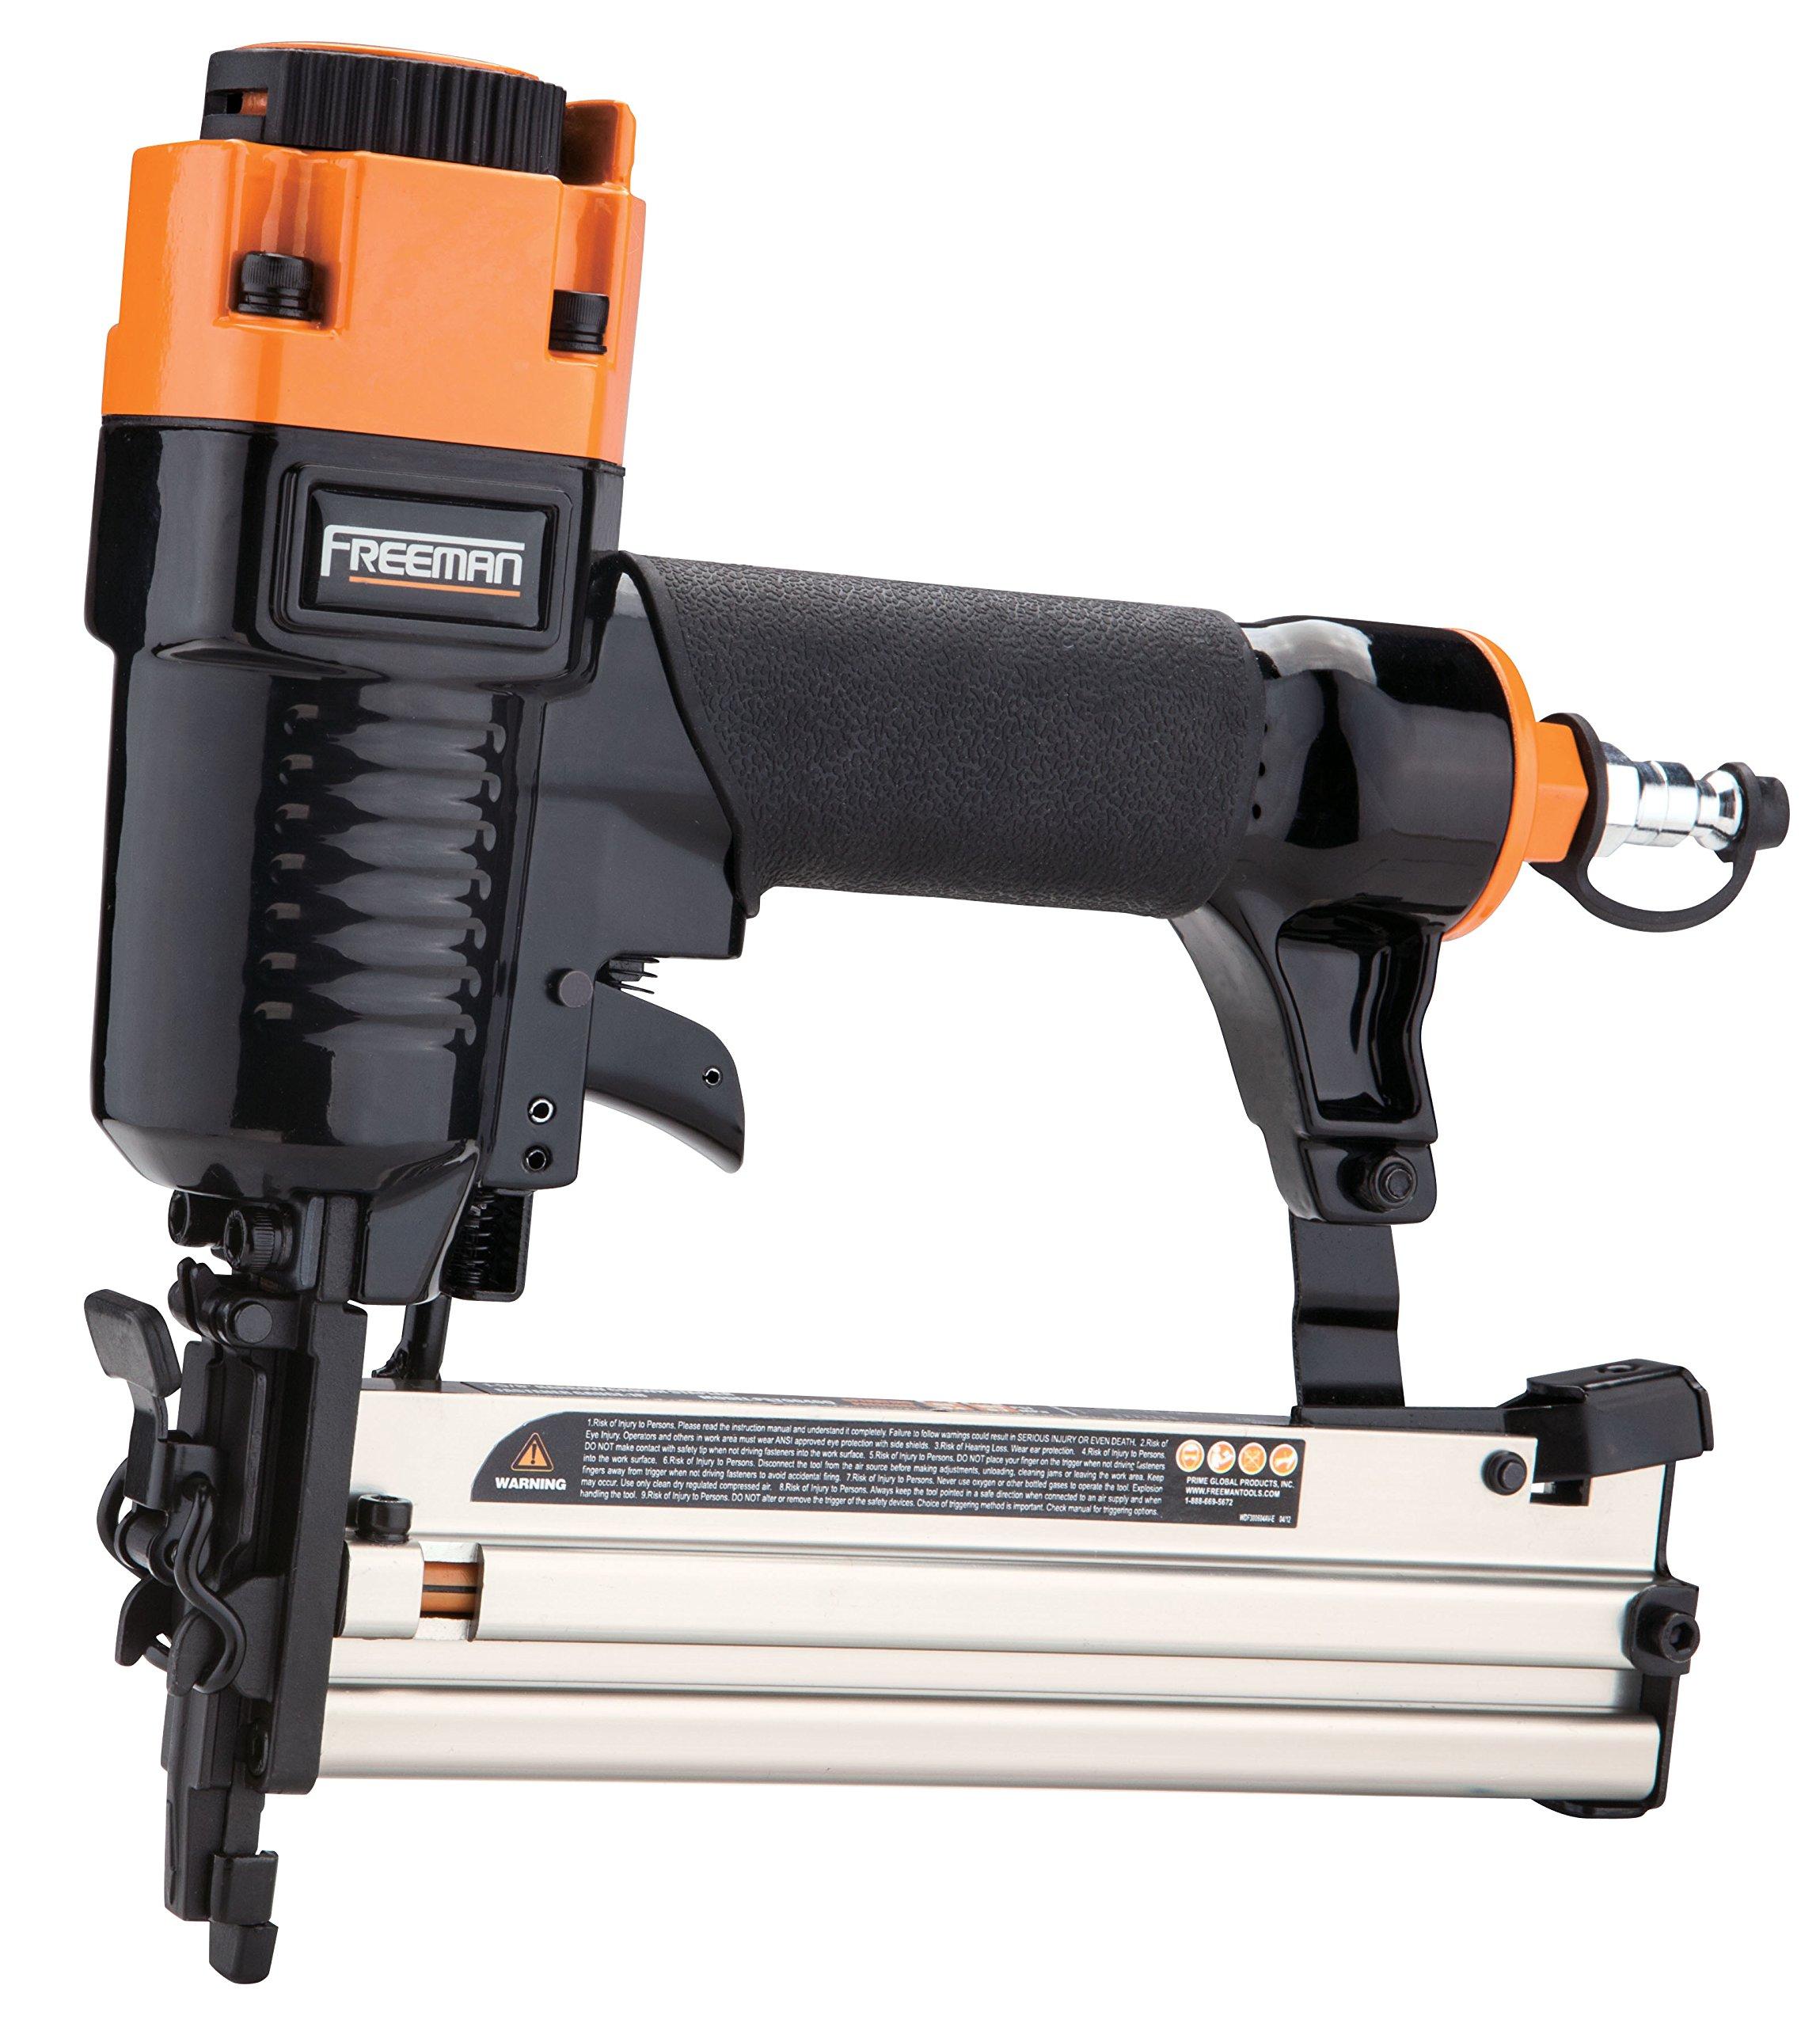 Freeman 18 Gauge Narrow Crown Stapler PST9040Q